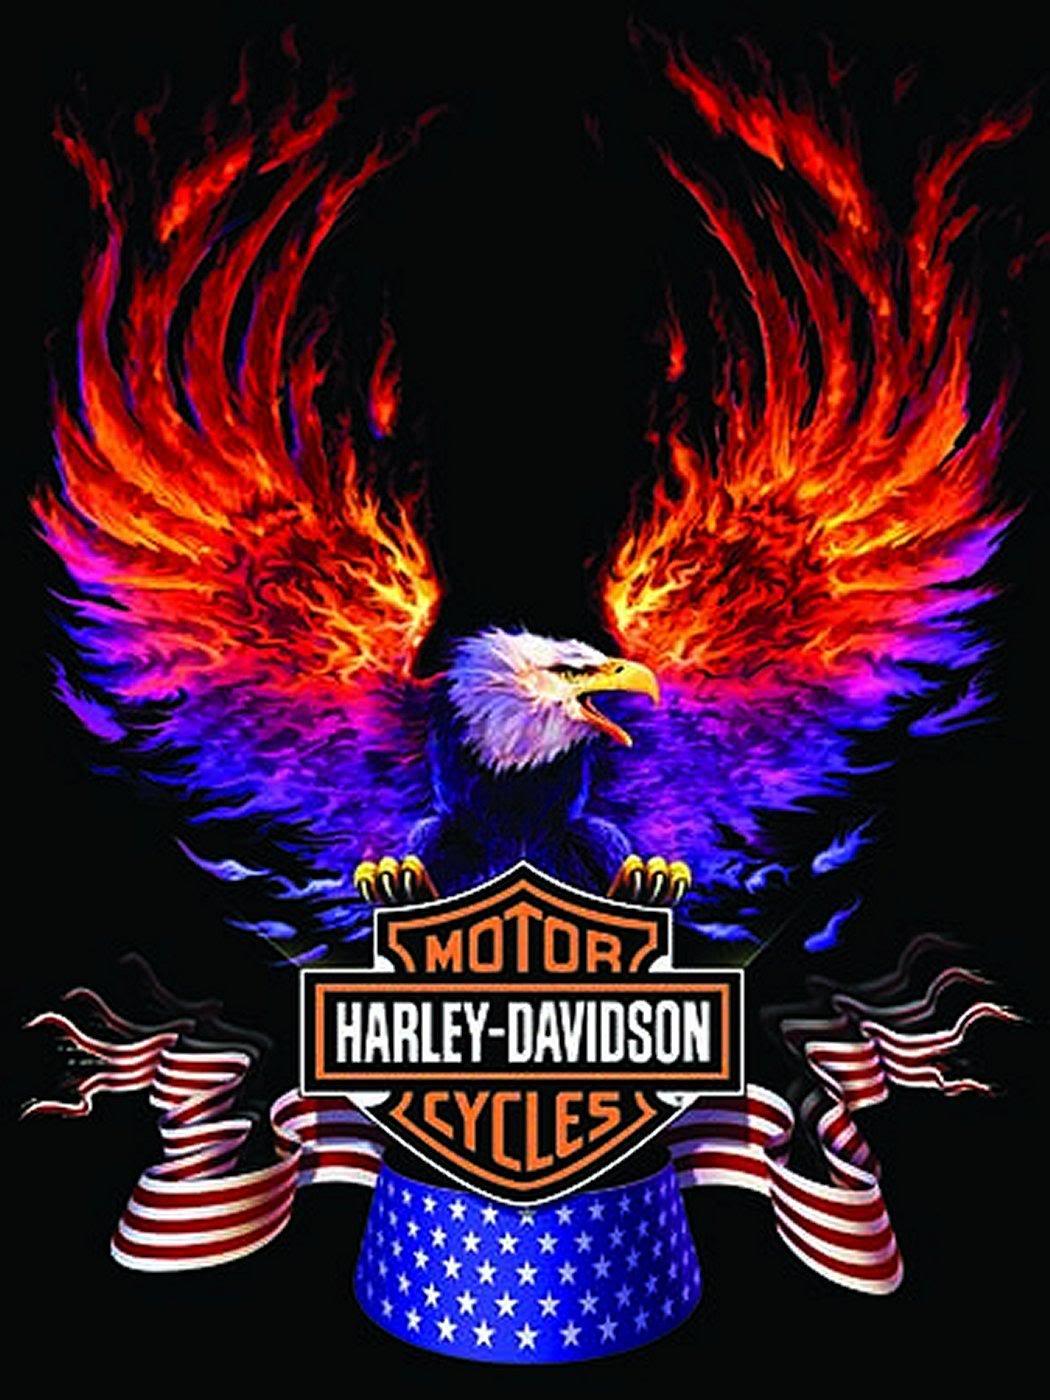 Harley Davidson Logo Wallpaper 6820 Hd Wallpapers in Logos   Imagesci 1050x1400